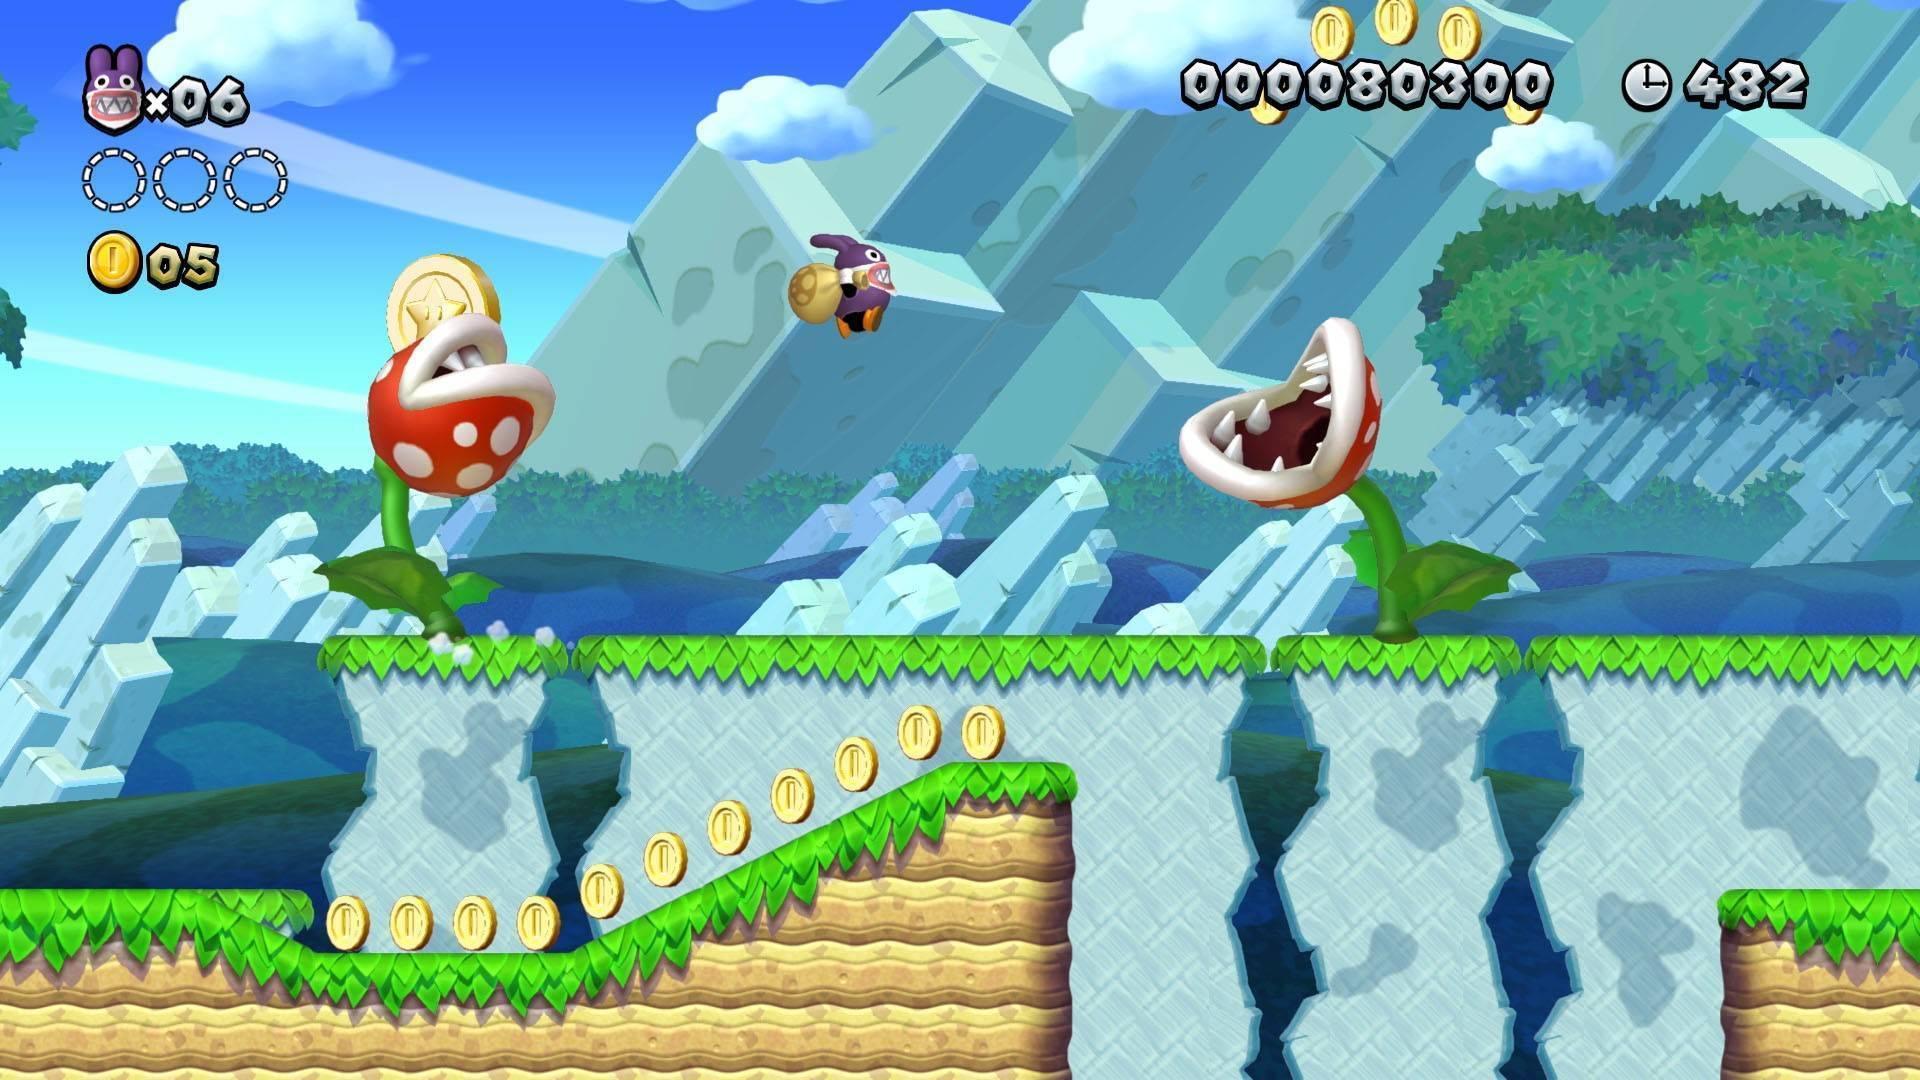 Buy New Super Mario Bros U Deluxe Nintendo Switch Price From 39 58